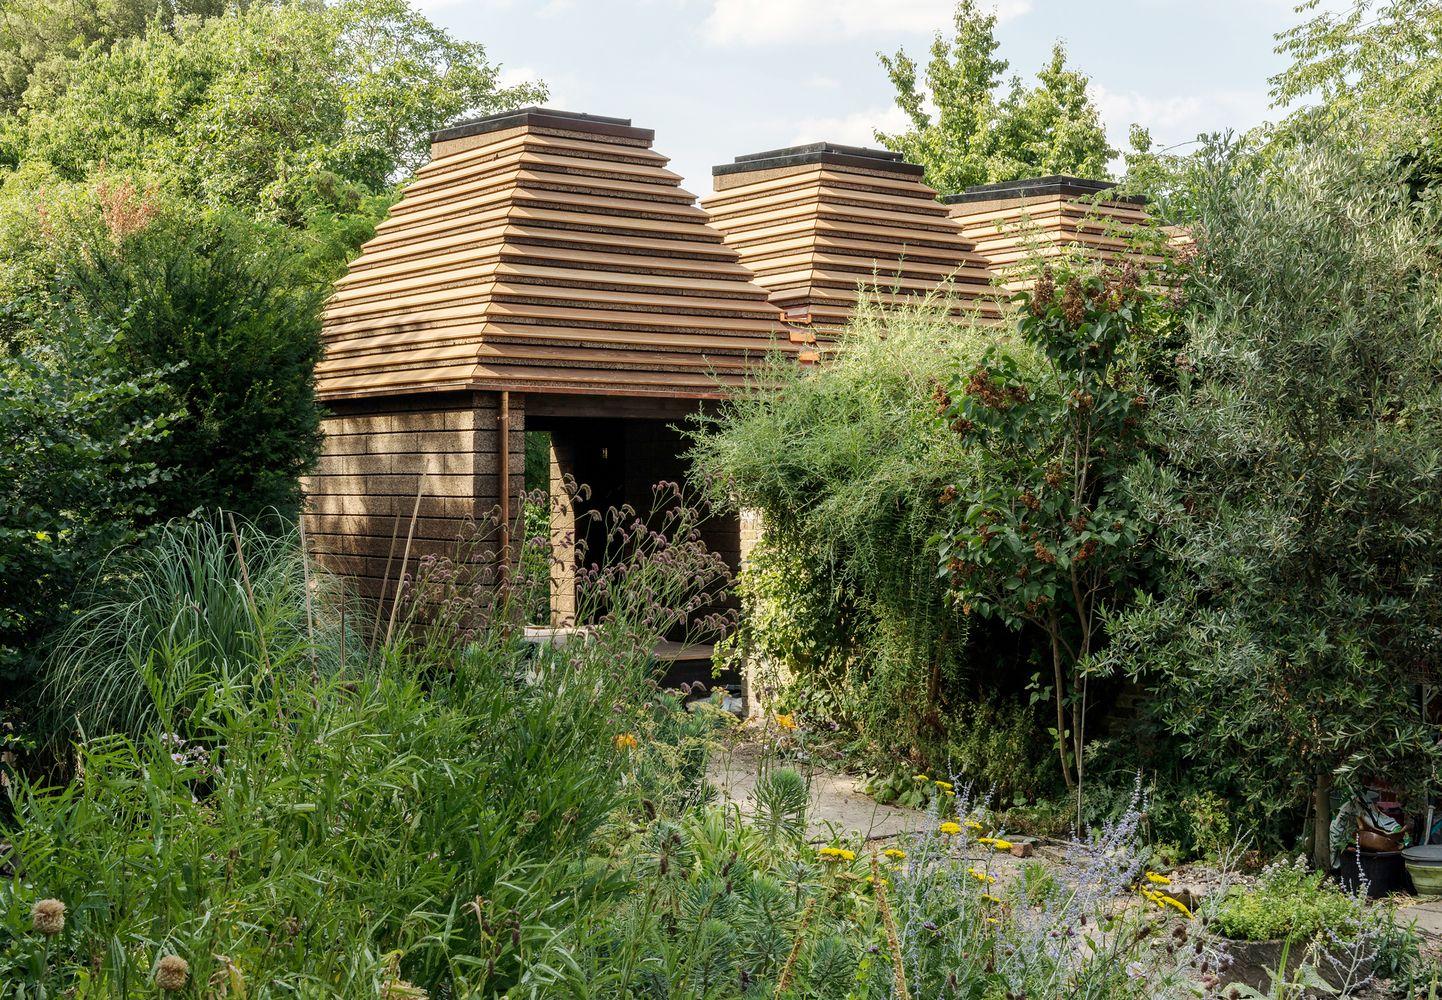 Gallery Of Cork House Matthew Barnett Howland Dido Milne Oliver Wilton 8 In 2020 Bartlett School Of Architecture Architects London Architecture